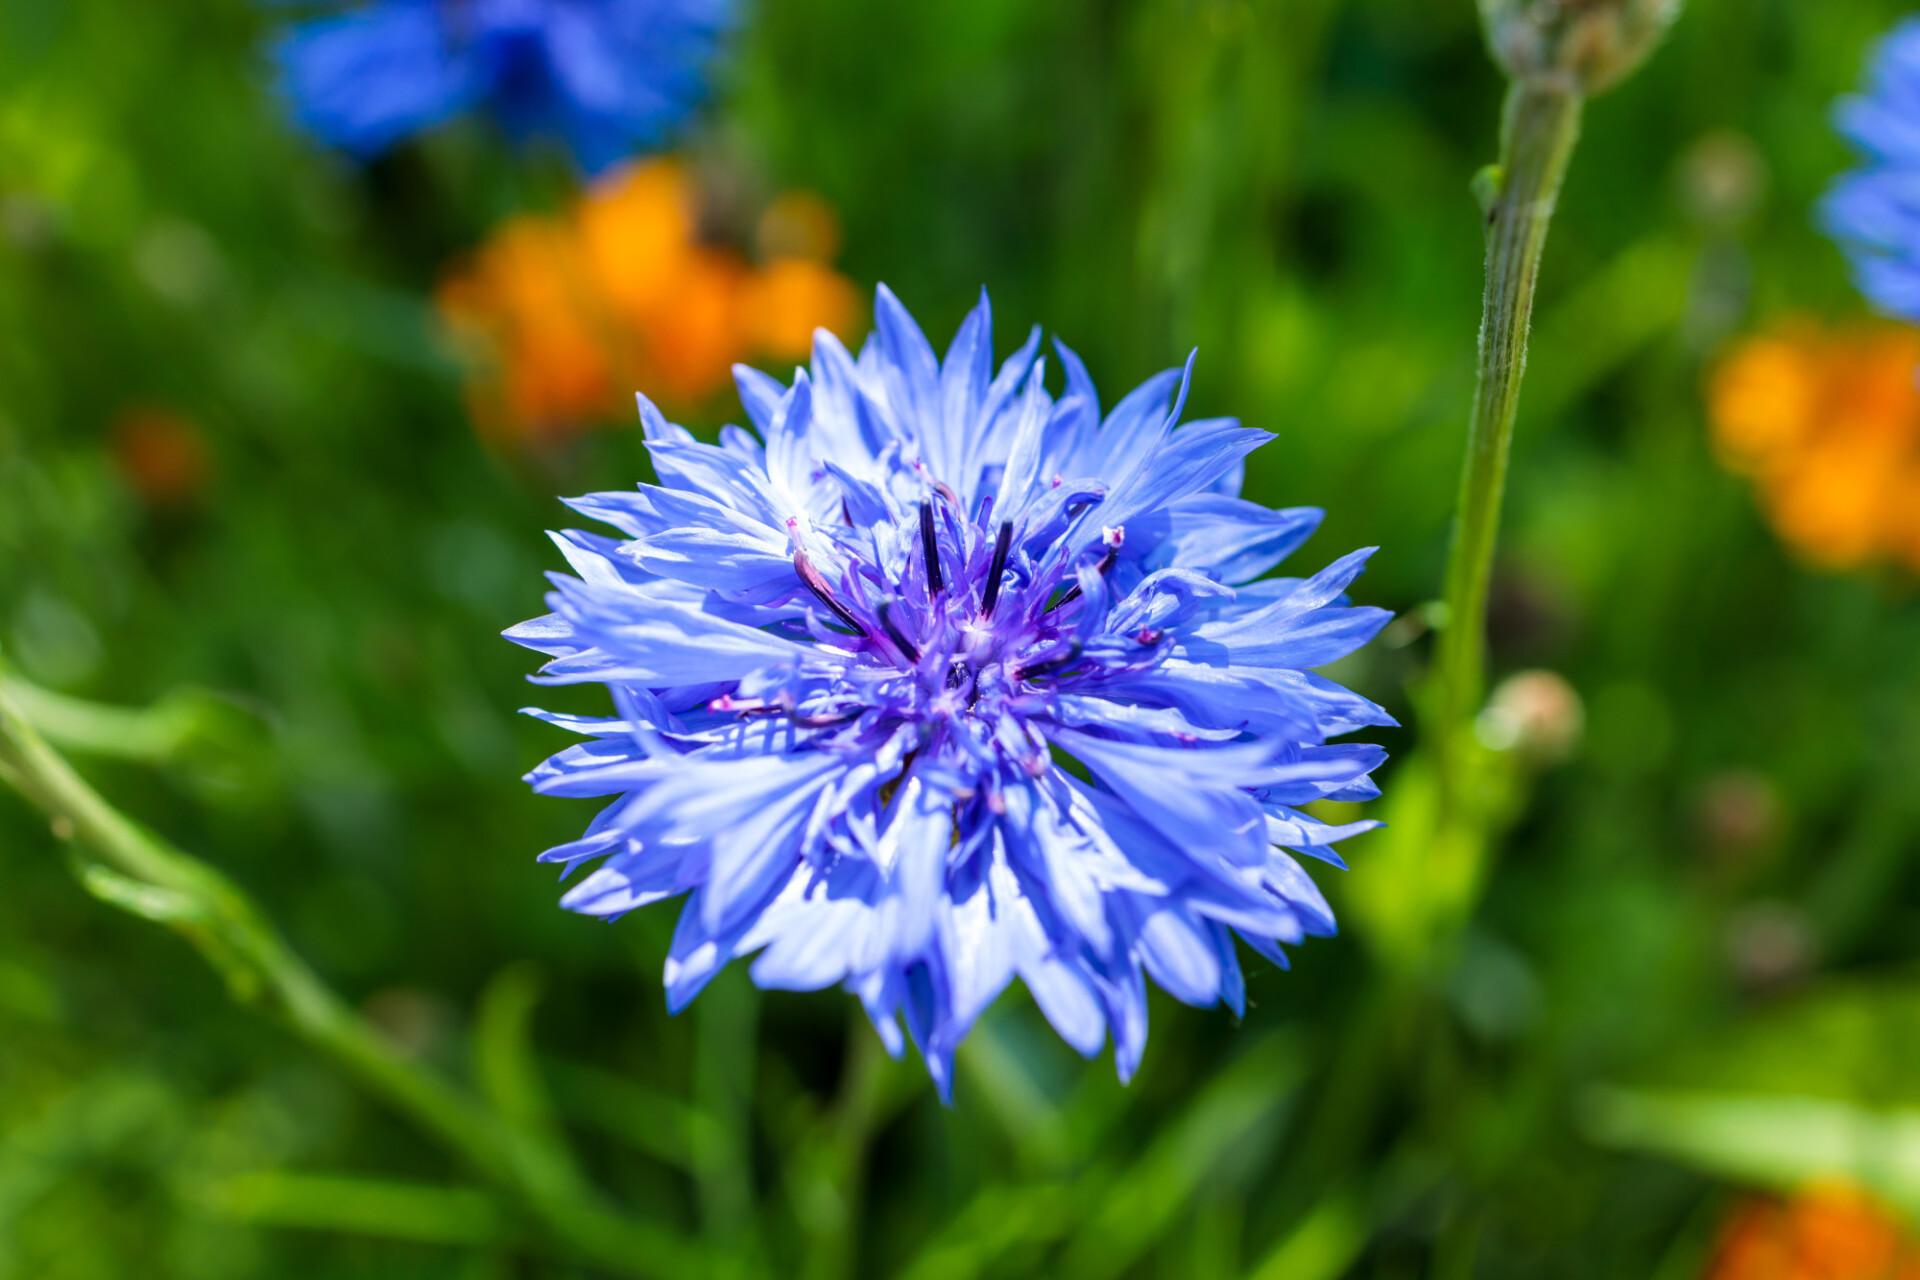 Close-up of a blue cornflower